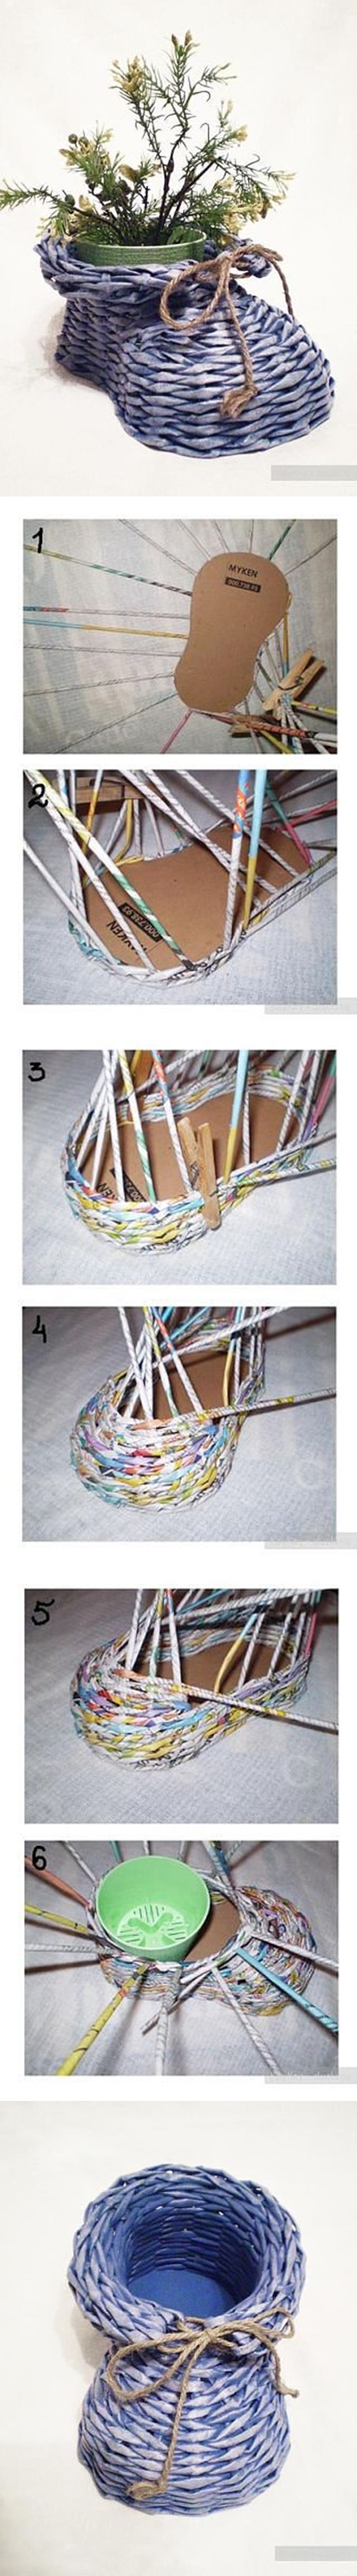 DIY Newpaper Roll Woven Shoe Vase tutorial